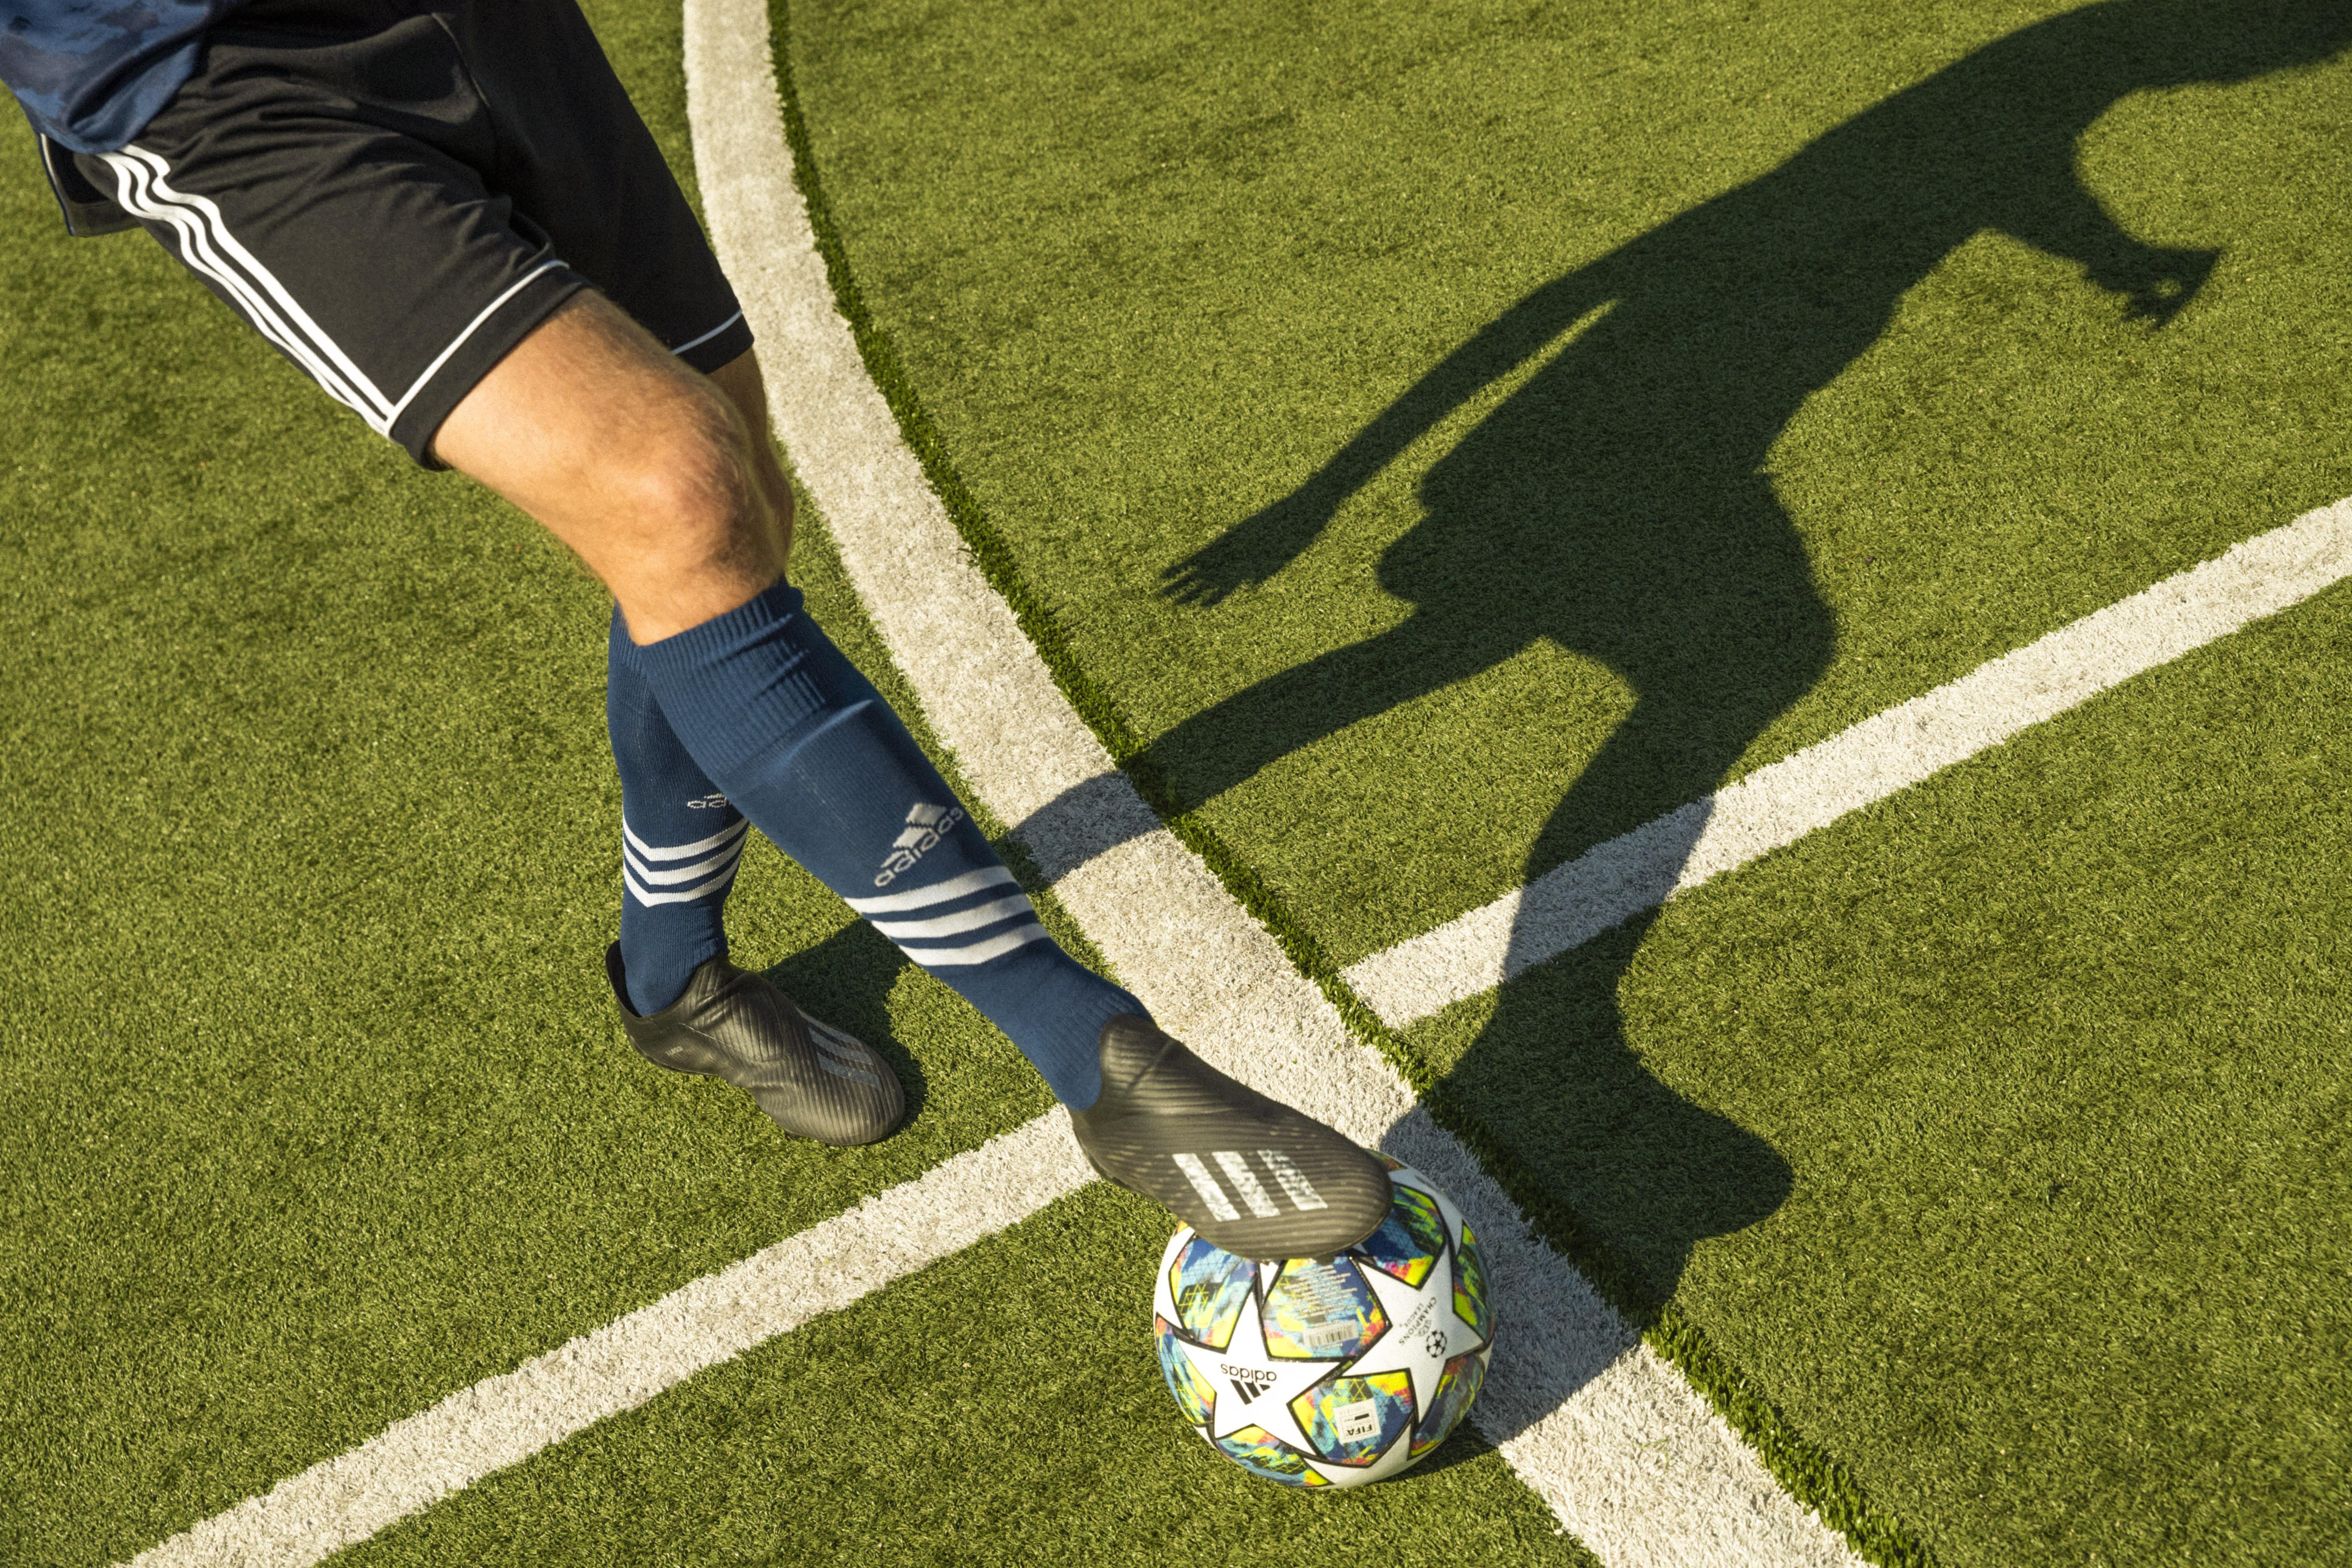 How-To-Kick-A-Soccer-Ball-Image-1